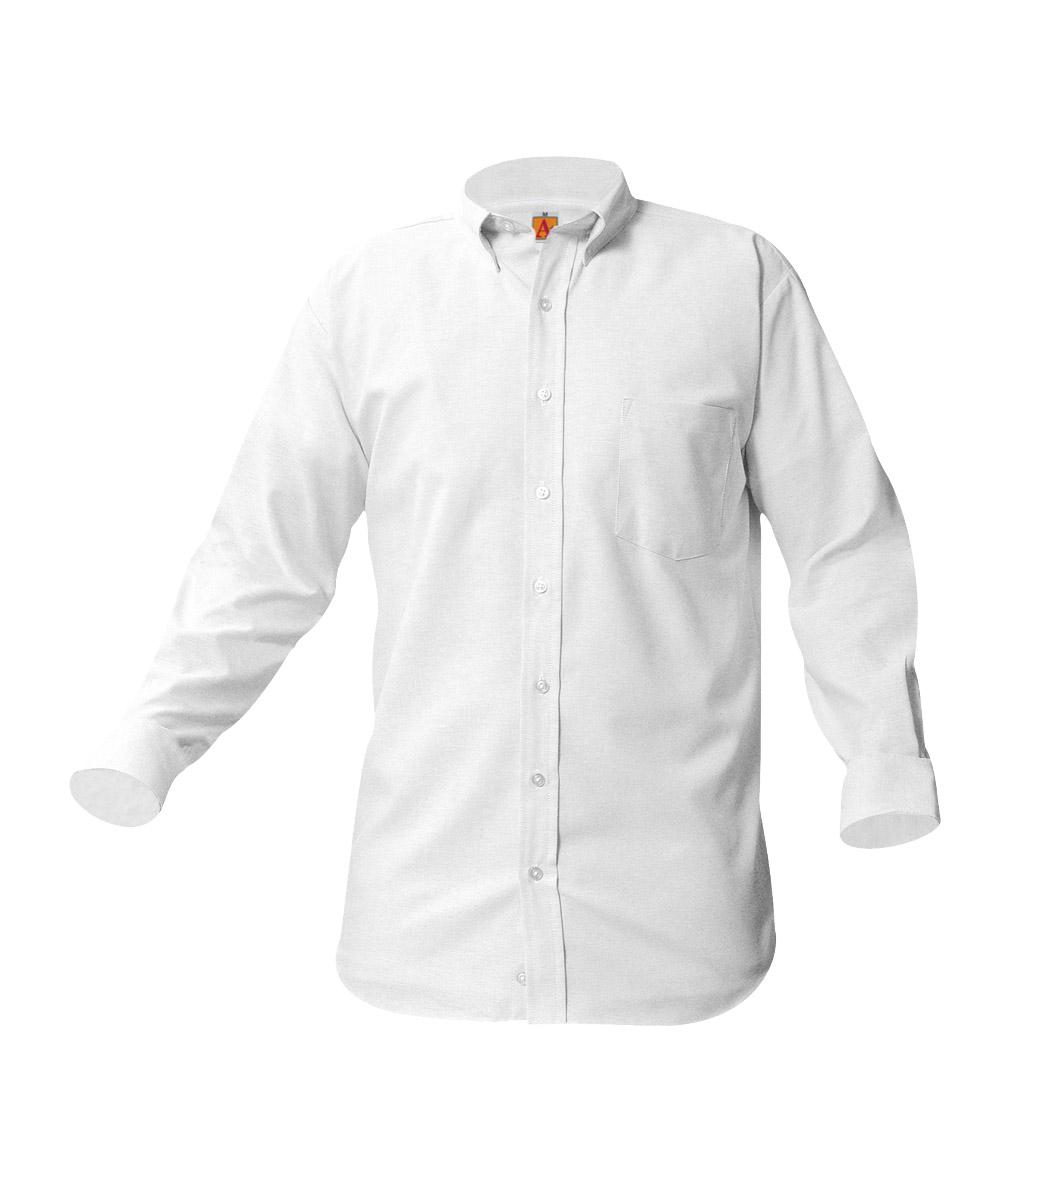 fa19ab44dc5 Boys  Long Sleeve Oxford Collar Shirt (3 Pc. Pack)